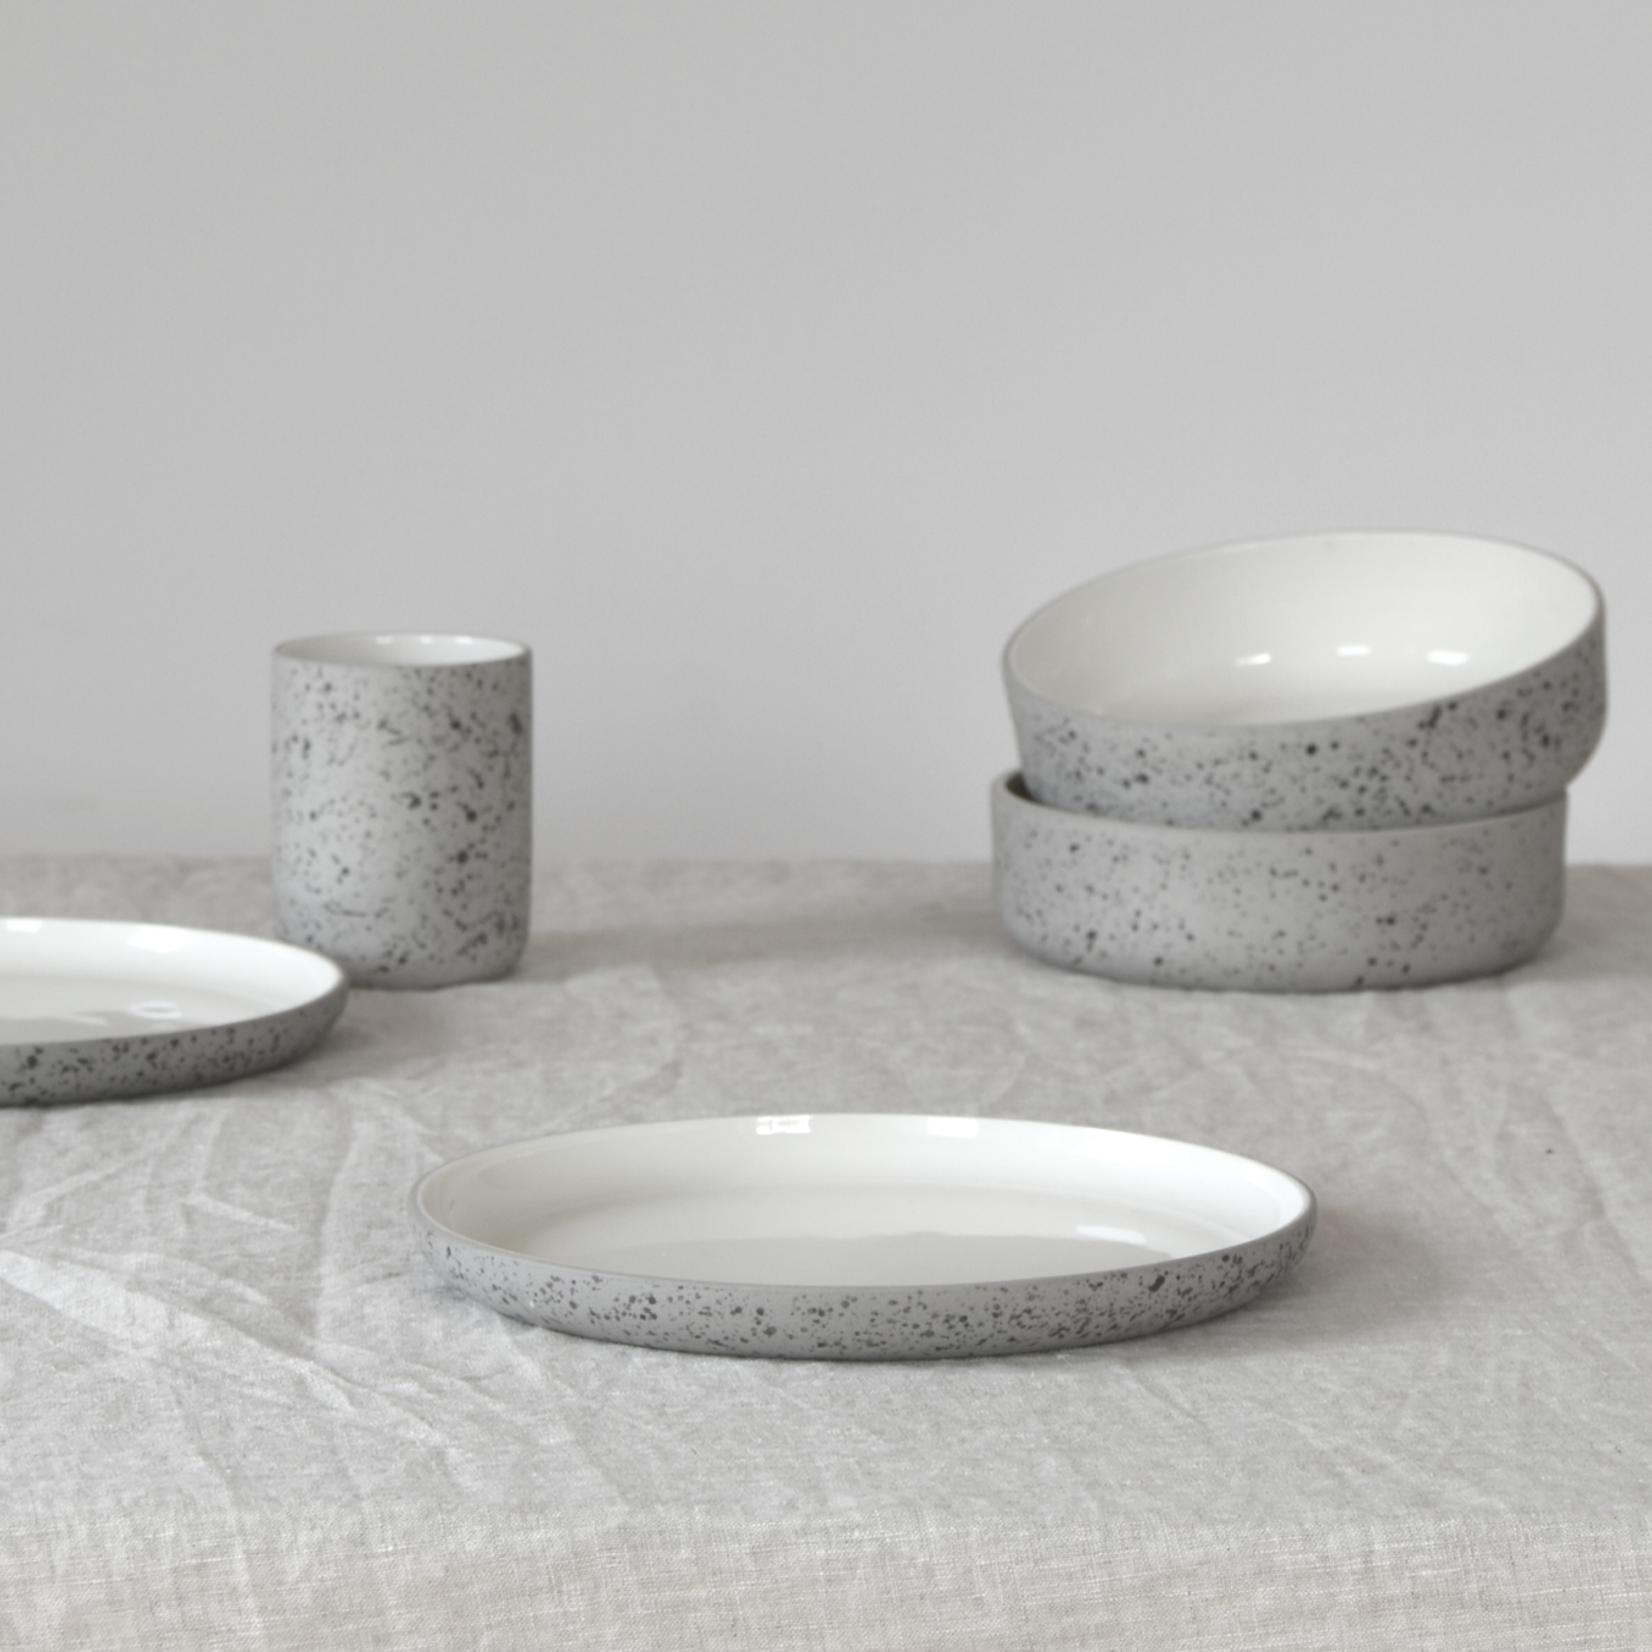 "Archive Studio Archive Studio Handmade Plate 8"" Speckled"